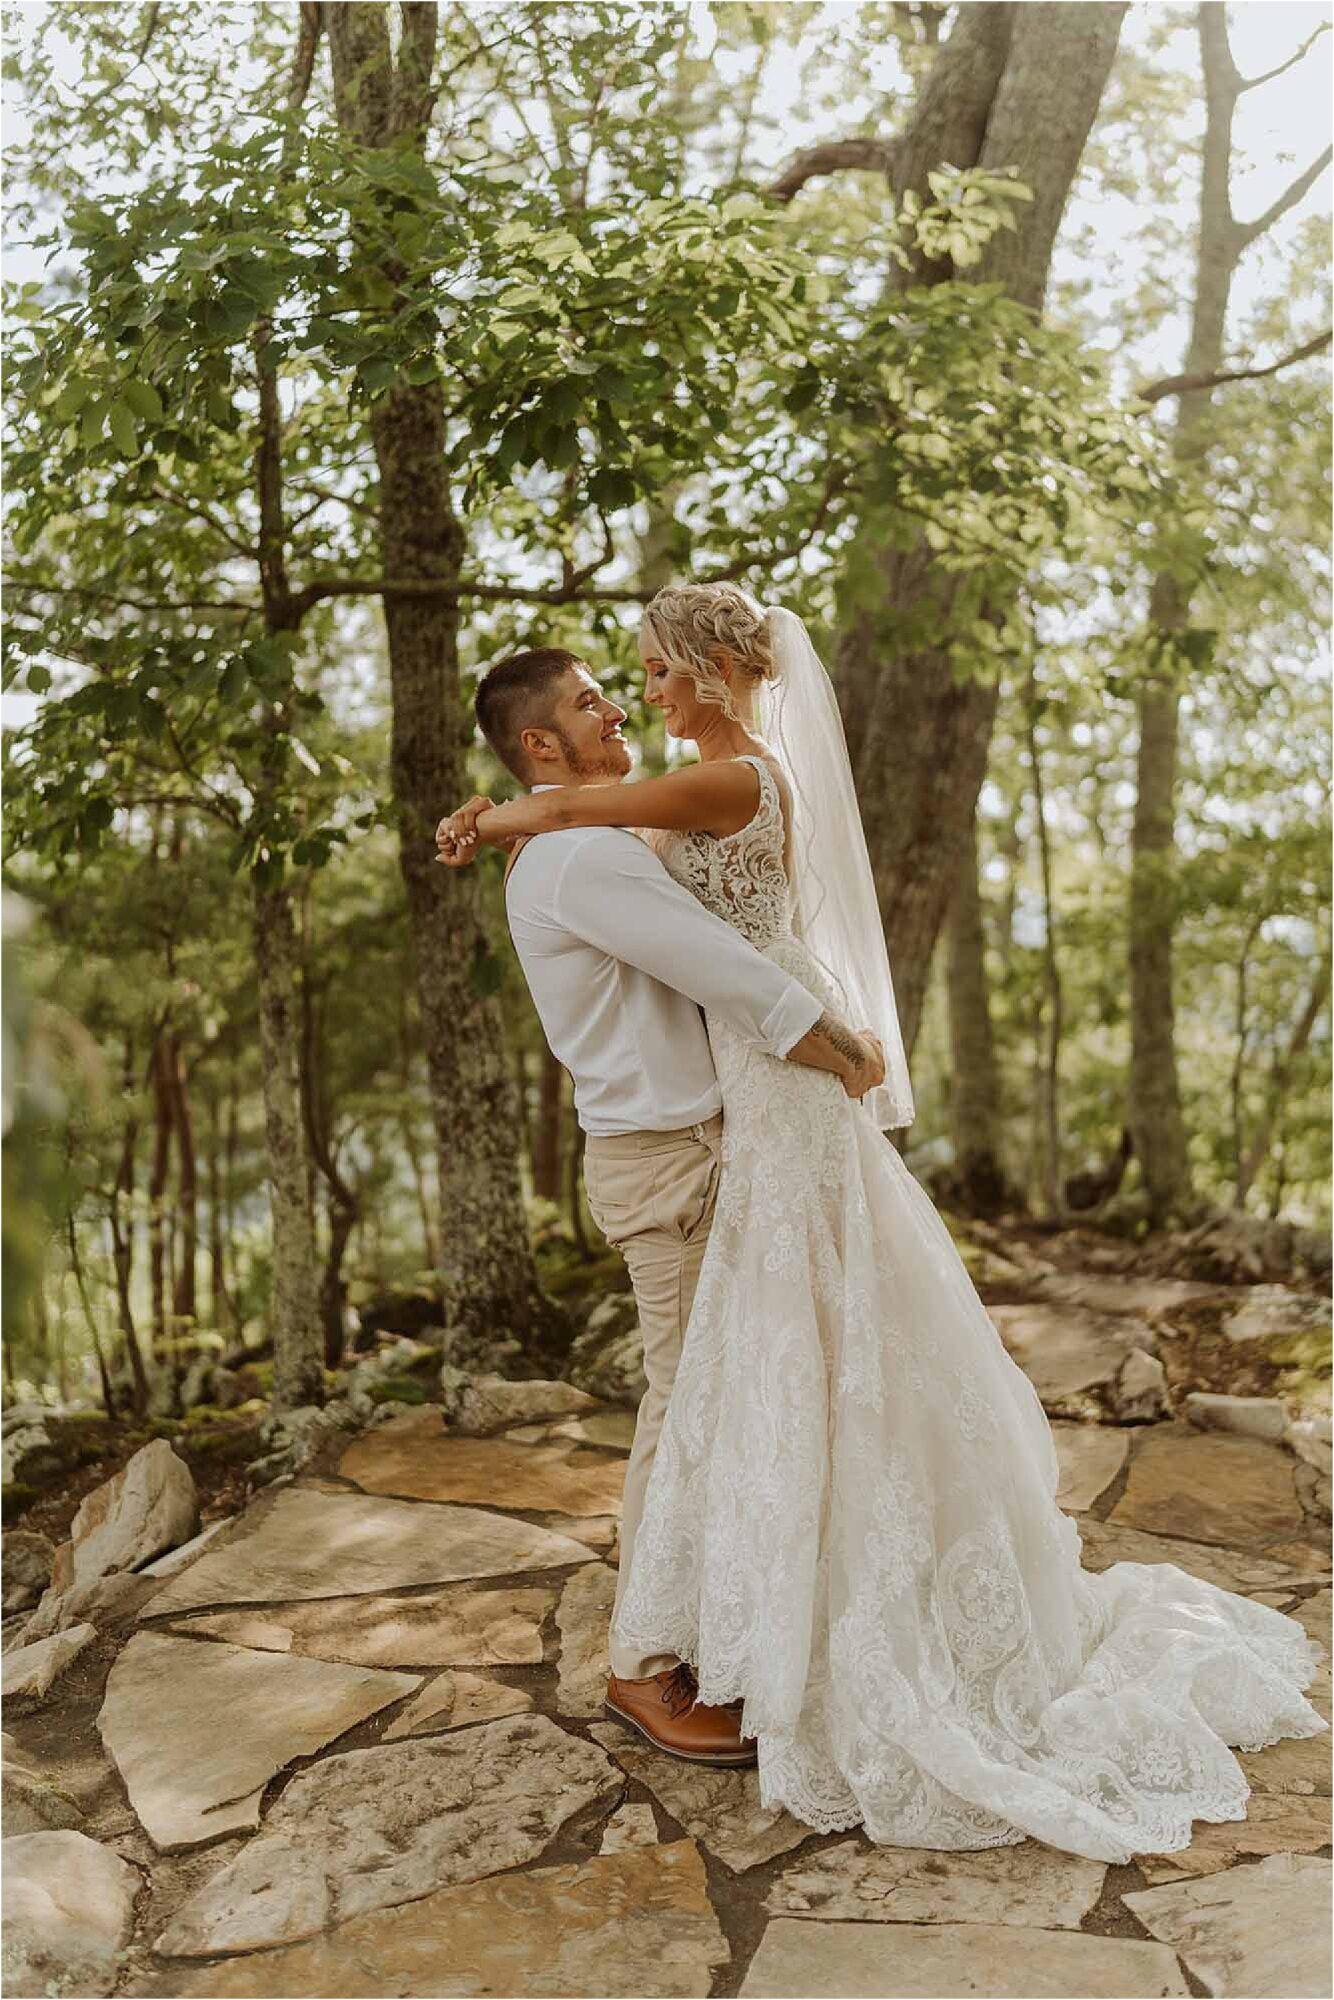 groom lifting up bride in woodland scene